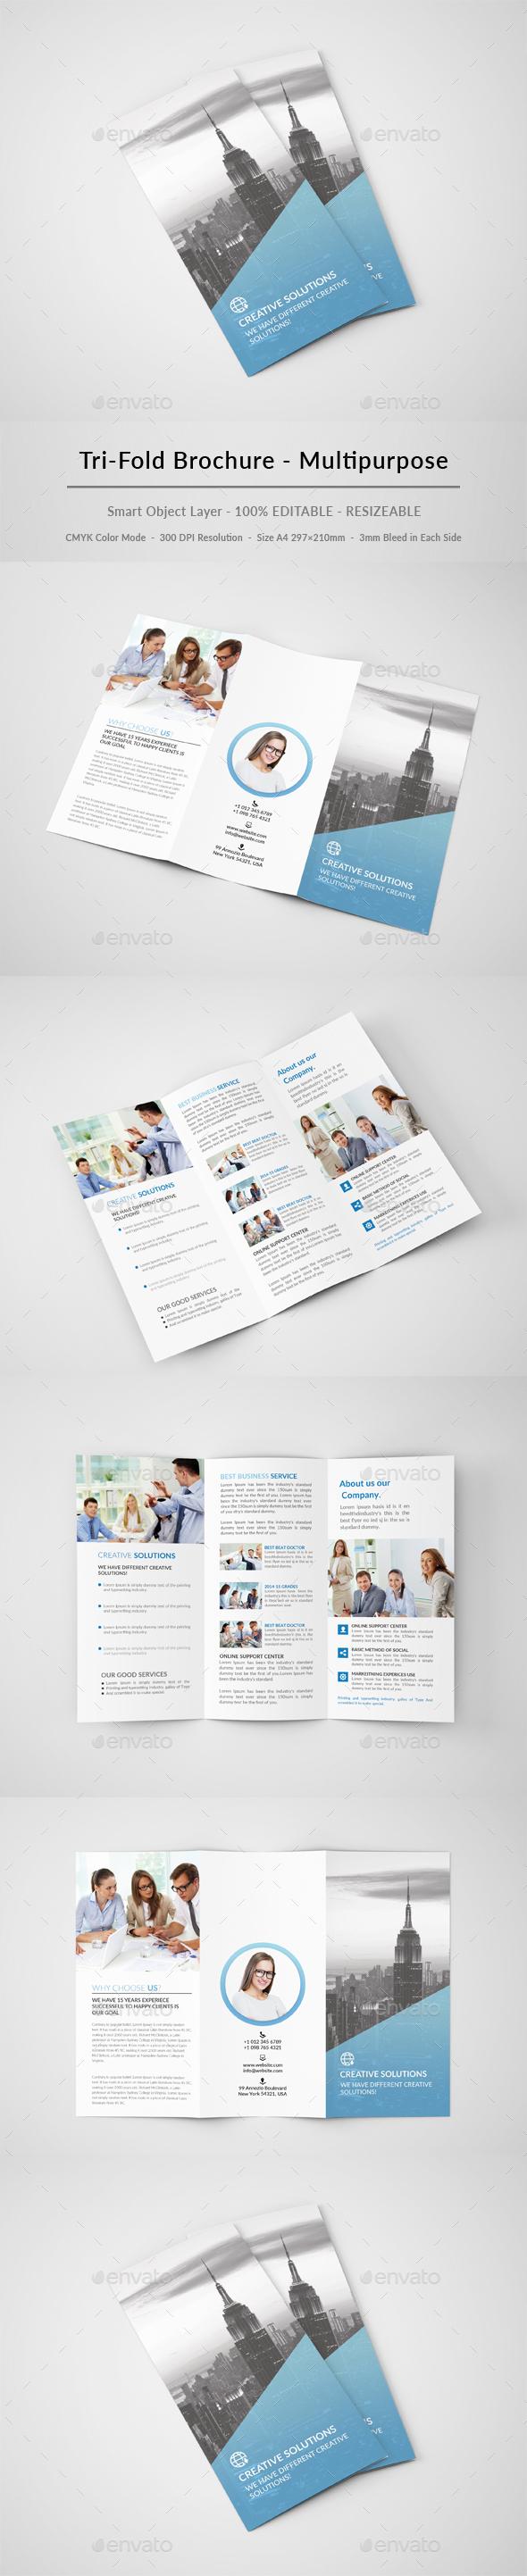 Creative Trifold Brochure Template PSD #design Download: http://graphicriver.net/item/creative-trifold-brochure/13289261?ref=ksioks